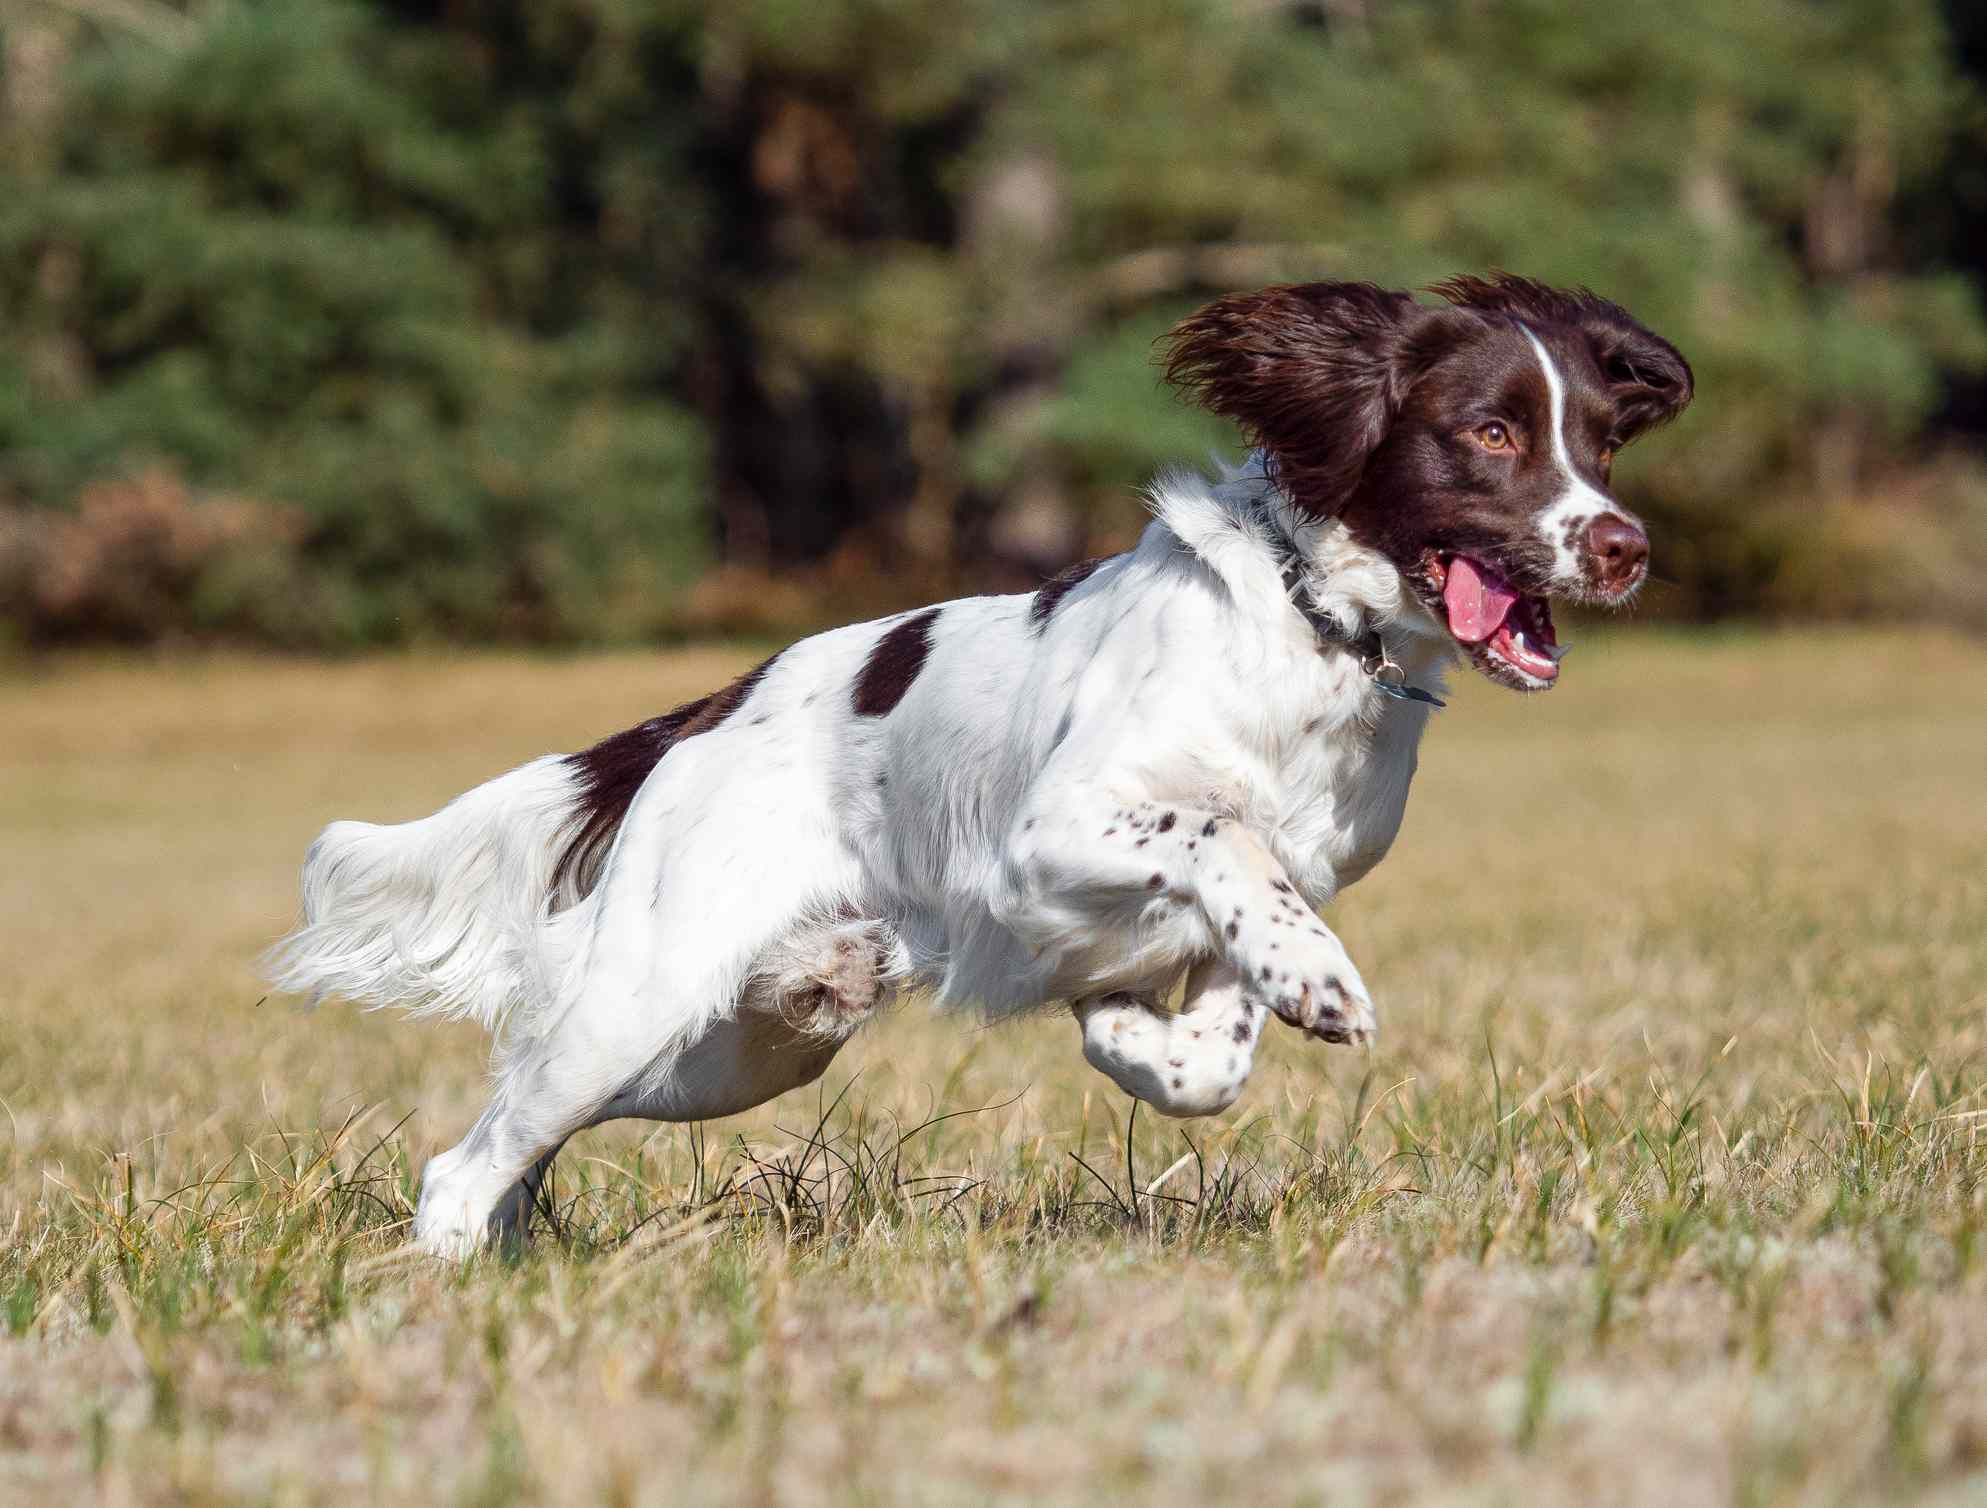 English Springer Spaniel leaping through a field